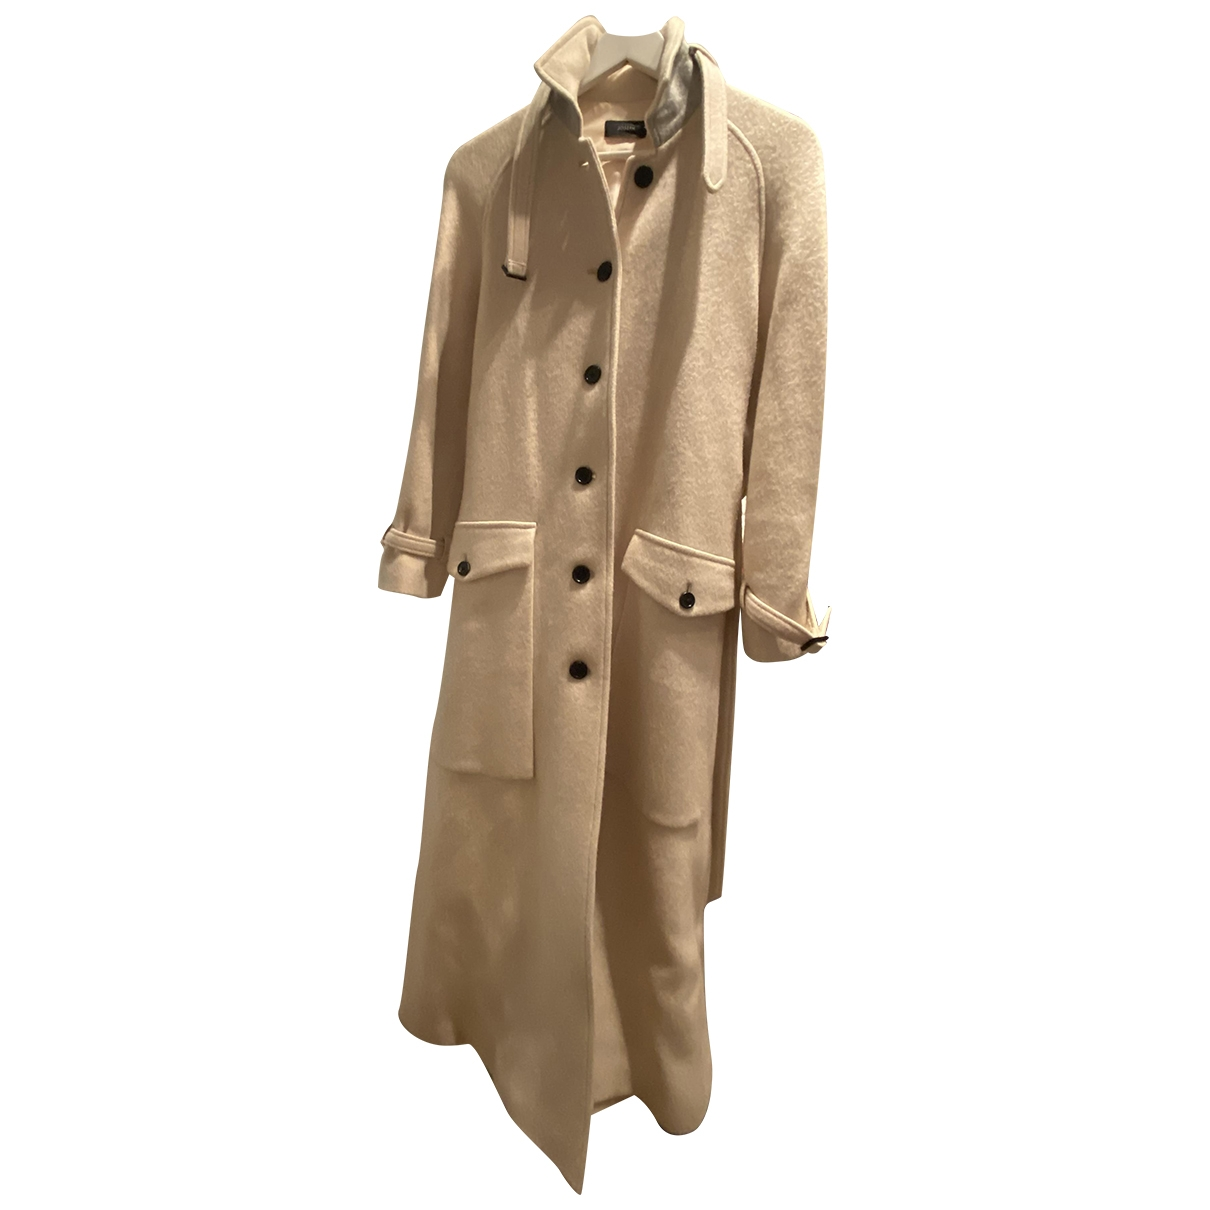 Joseph \N Ecru Wool coat for Women M International